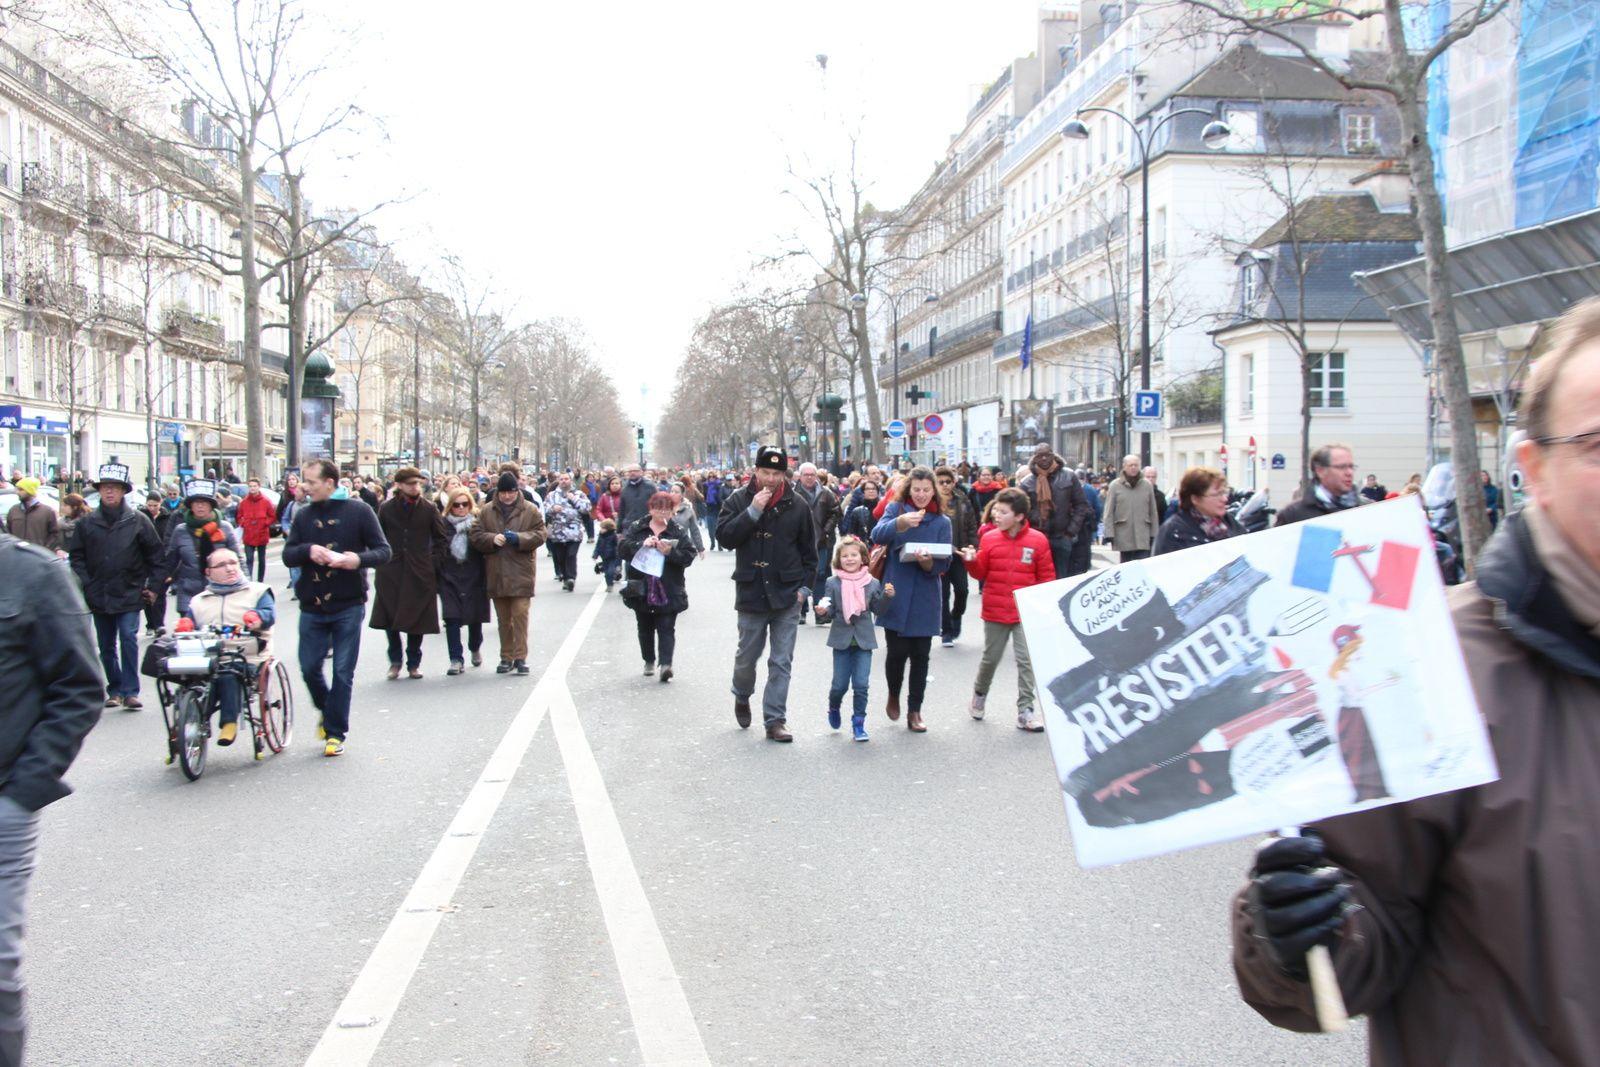 #Jesuismemoire